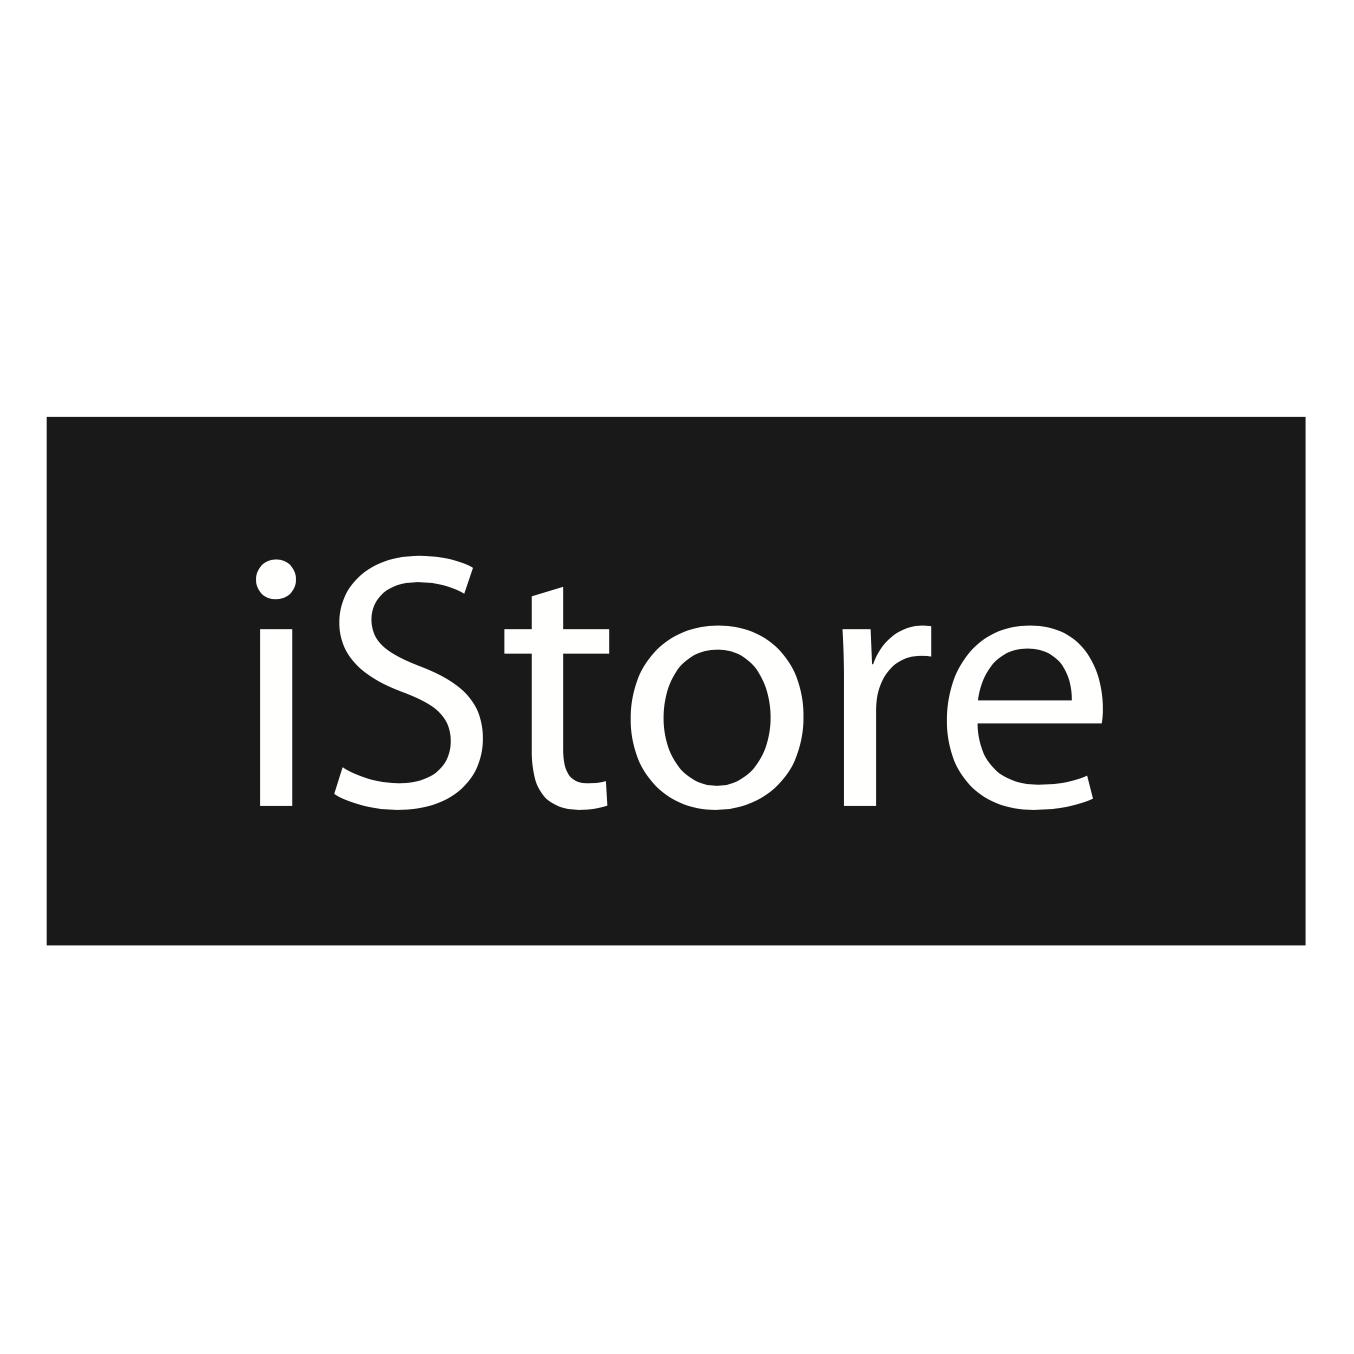 iPhone 6 Plus Halo Snap Case - Black